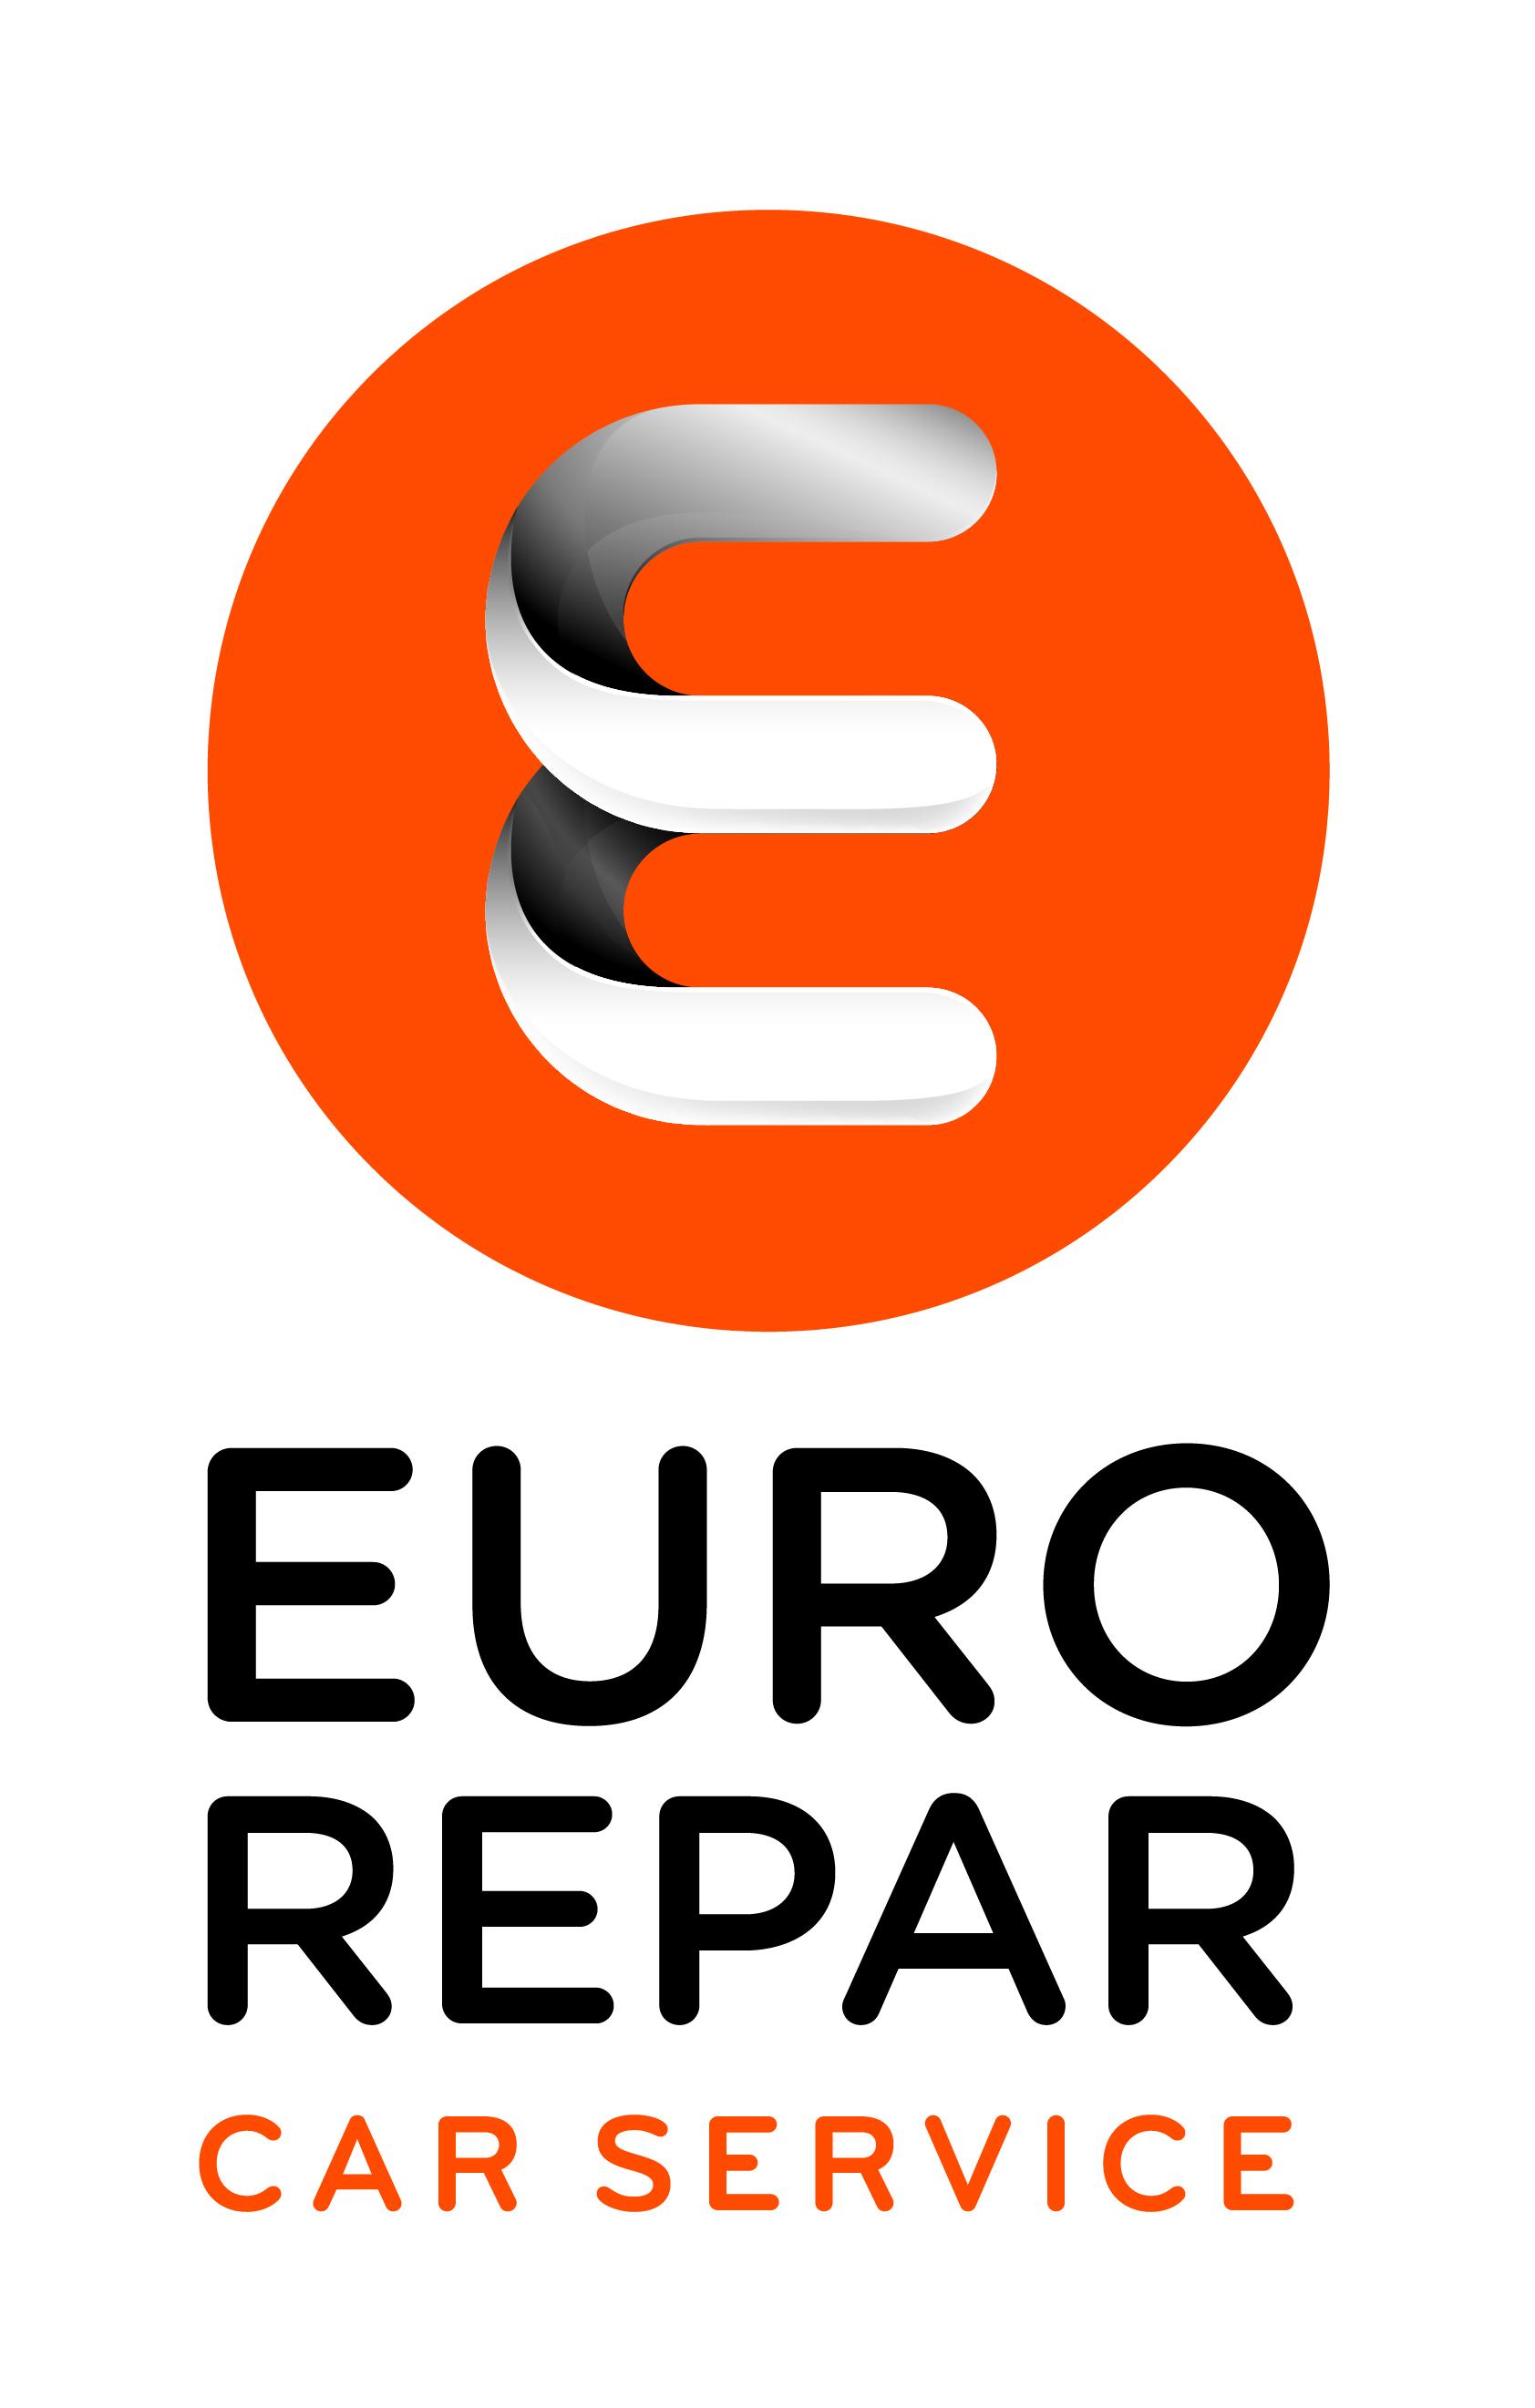 CR Automobil Handwerk logo